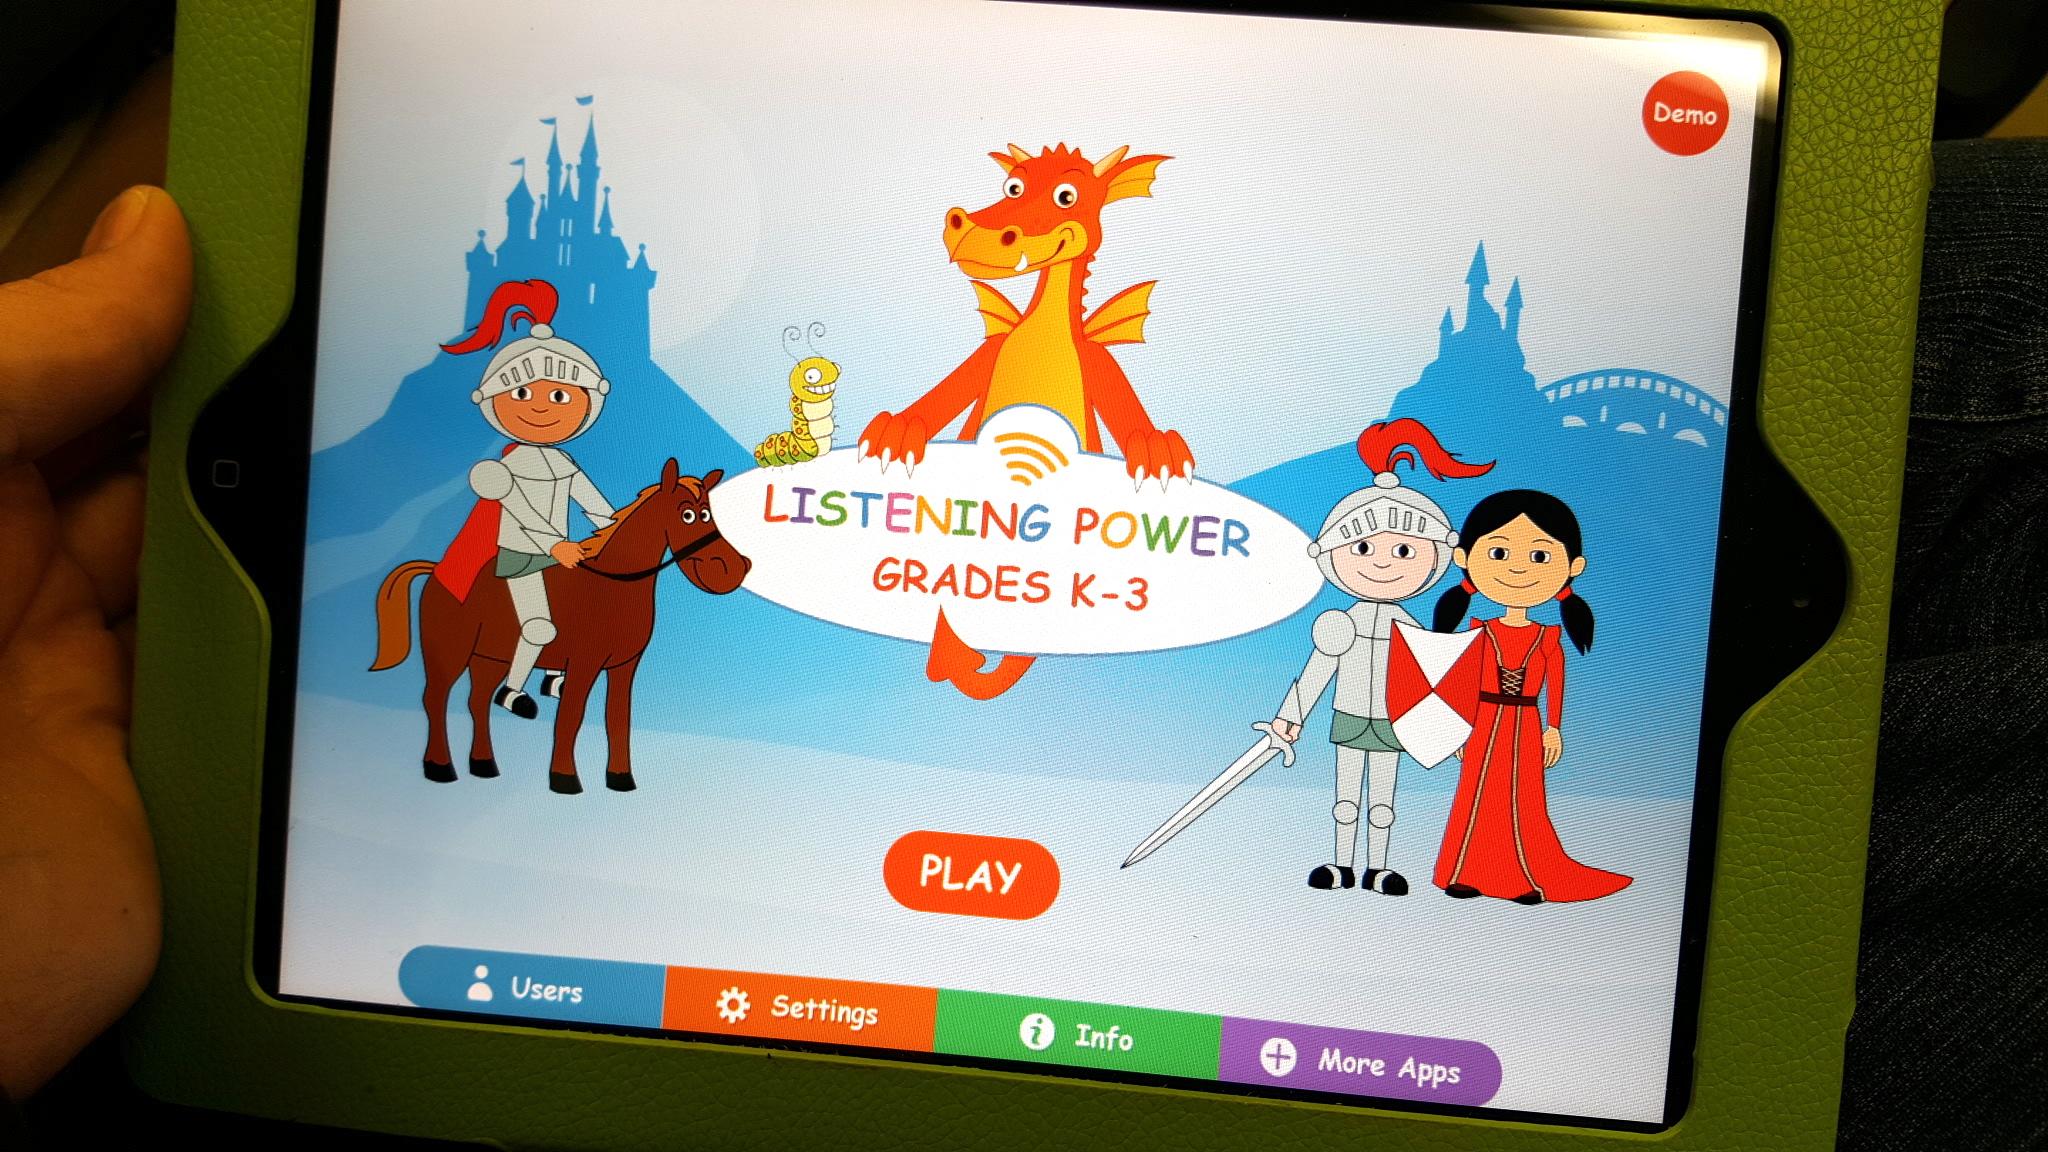 Listening Power Grades K-3 HD By Hamaguchi Apps for Speech, Language & Auditory Development